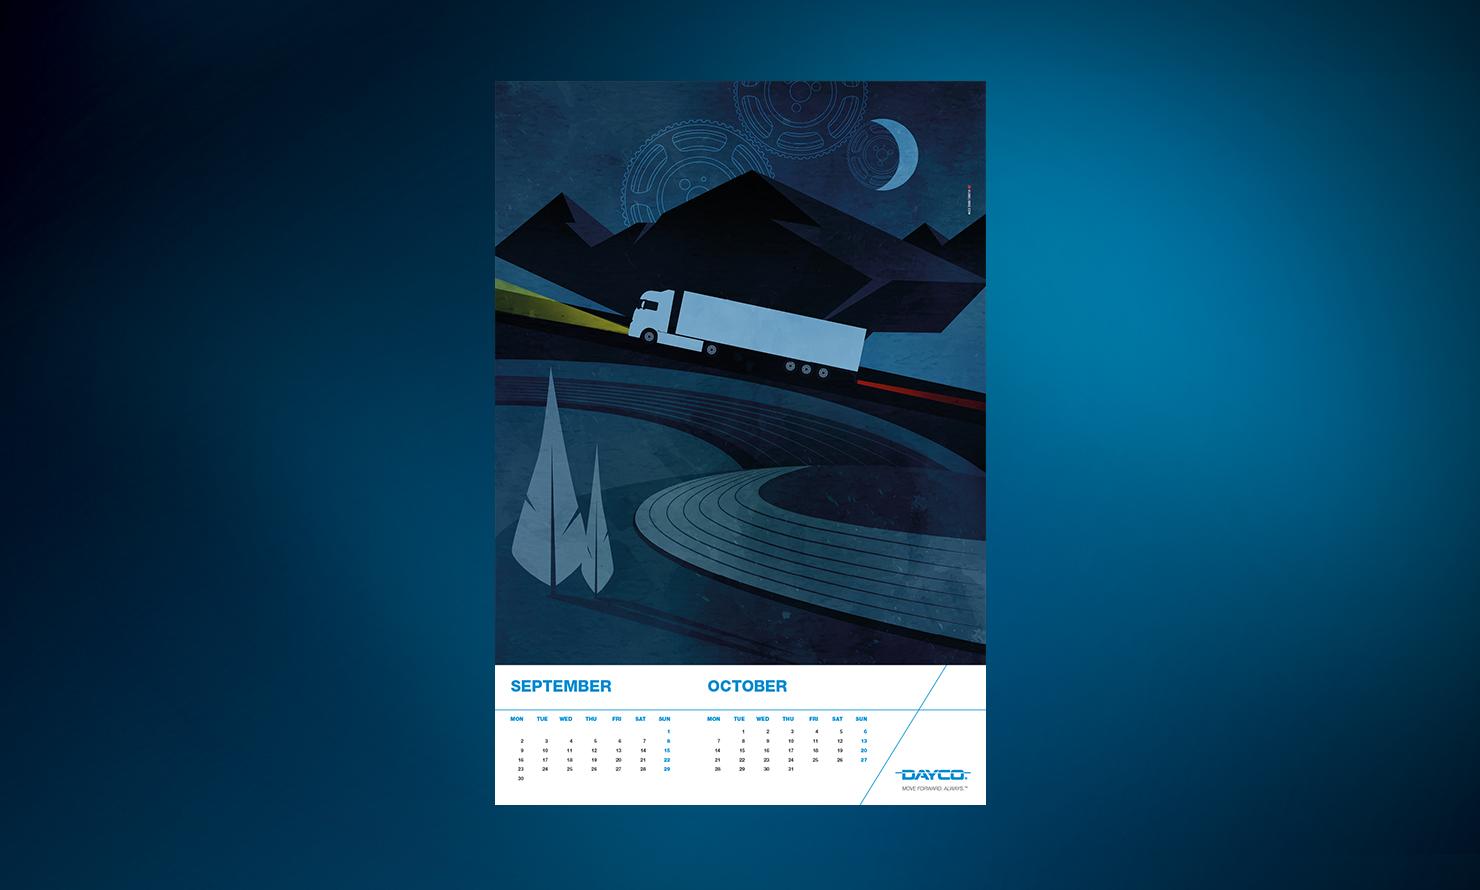 https://www.kubelibre.com/uploads/Slider-work-tutti-clienti/dayco-calendario-2019-5.jpg